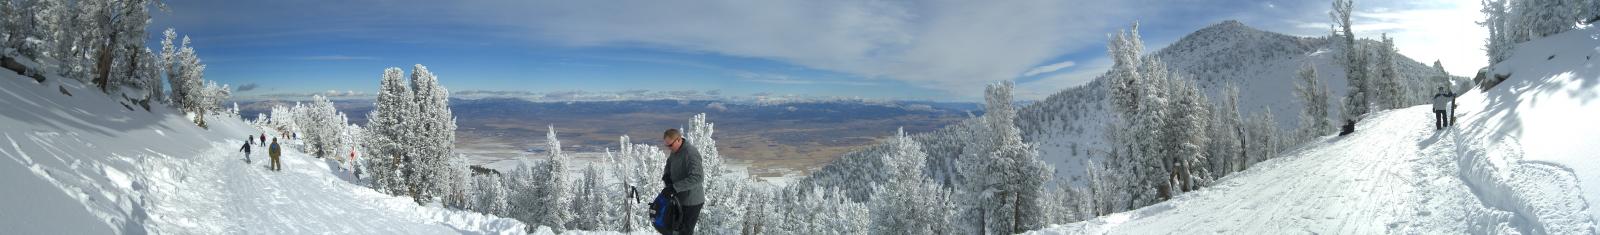 Nevada from Heavenly